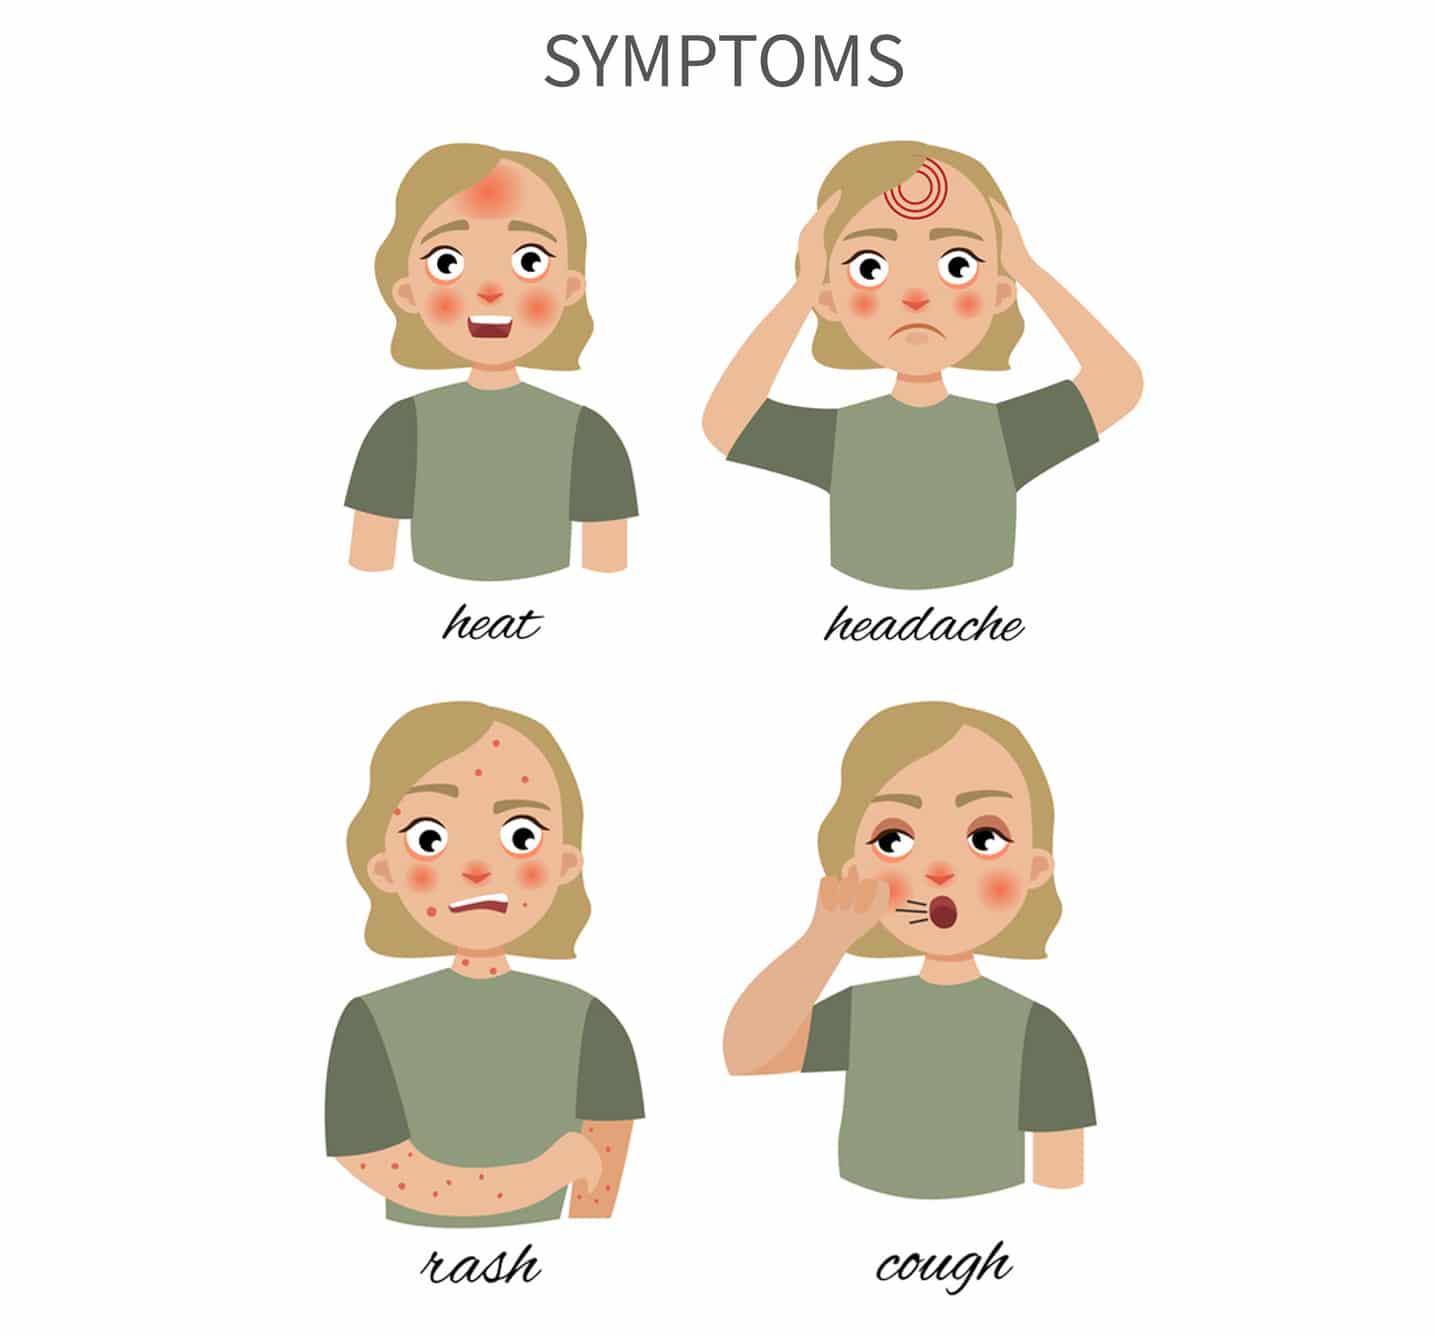 the symptoms of chickenpox include heat, headache, rash, and cough